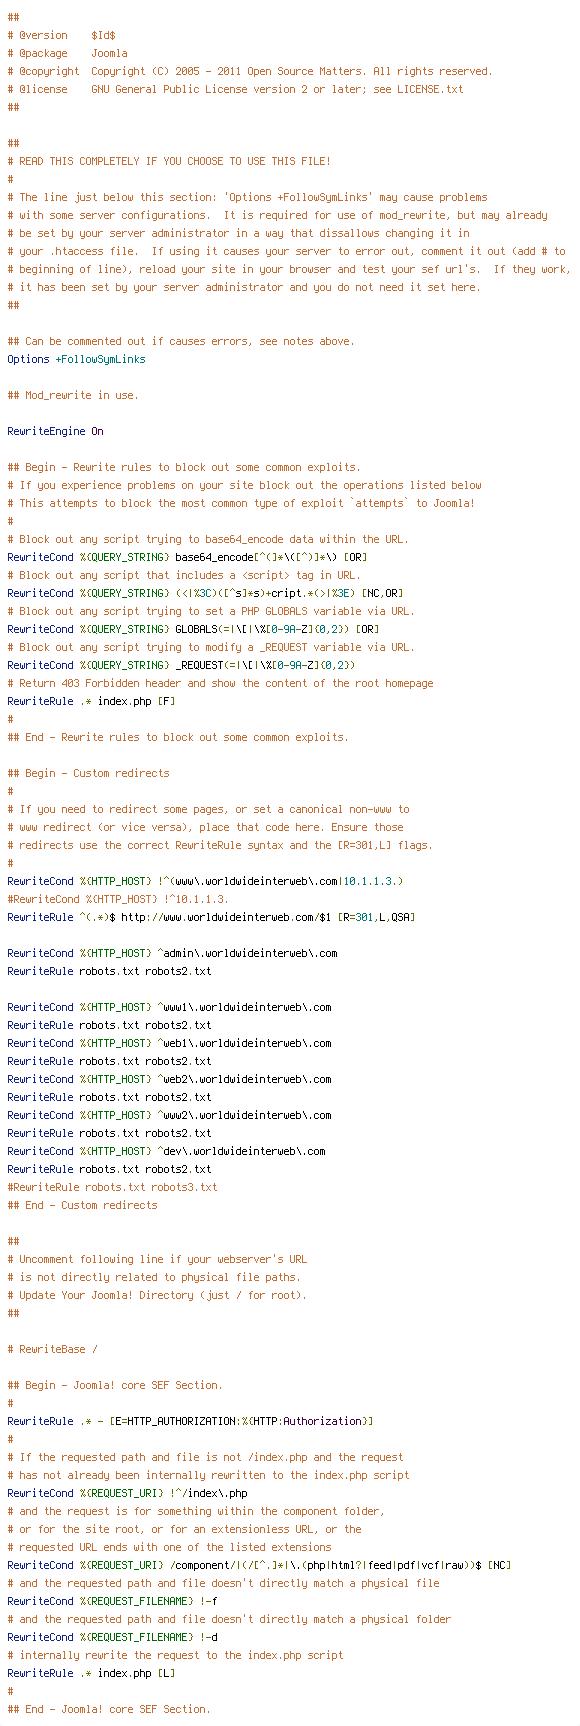 thomascooper/joomla-173/master/ htaccess - Htaccess File